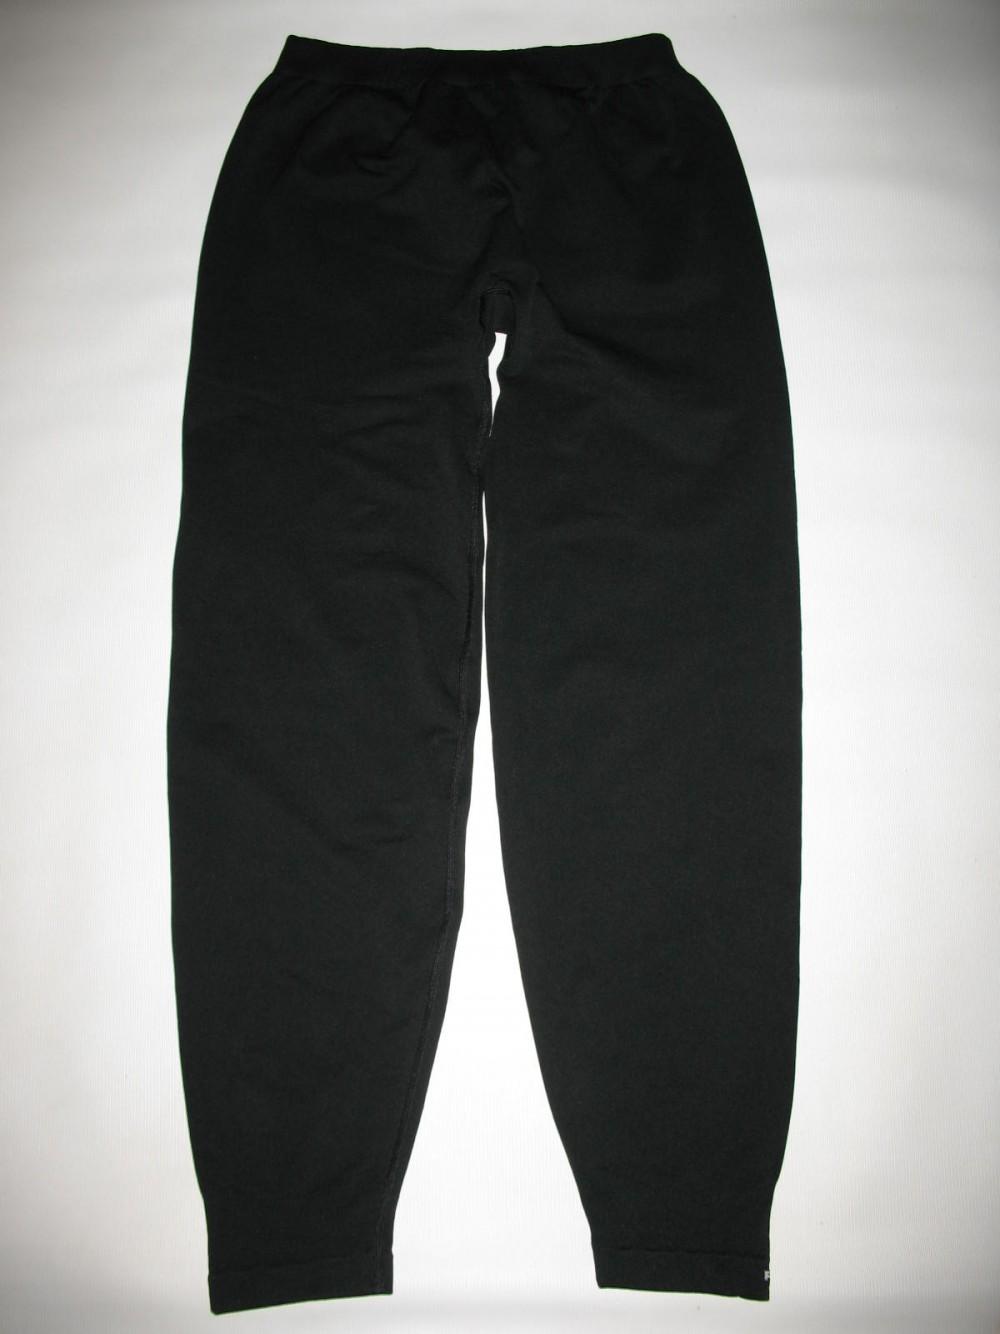 Штаны белье FALKE compression underwear pants (размер XXL) - 1